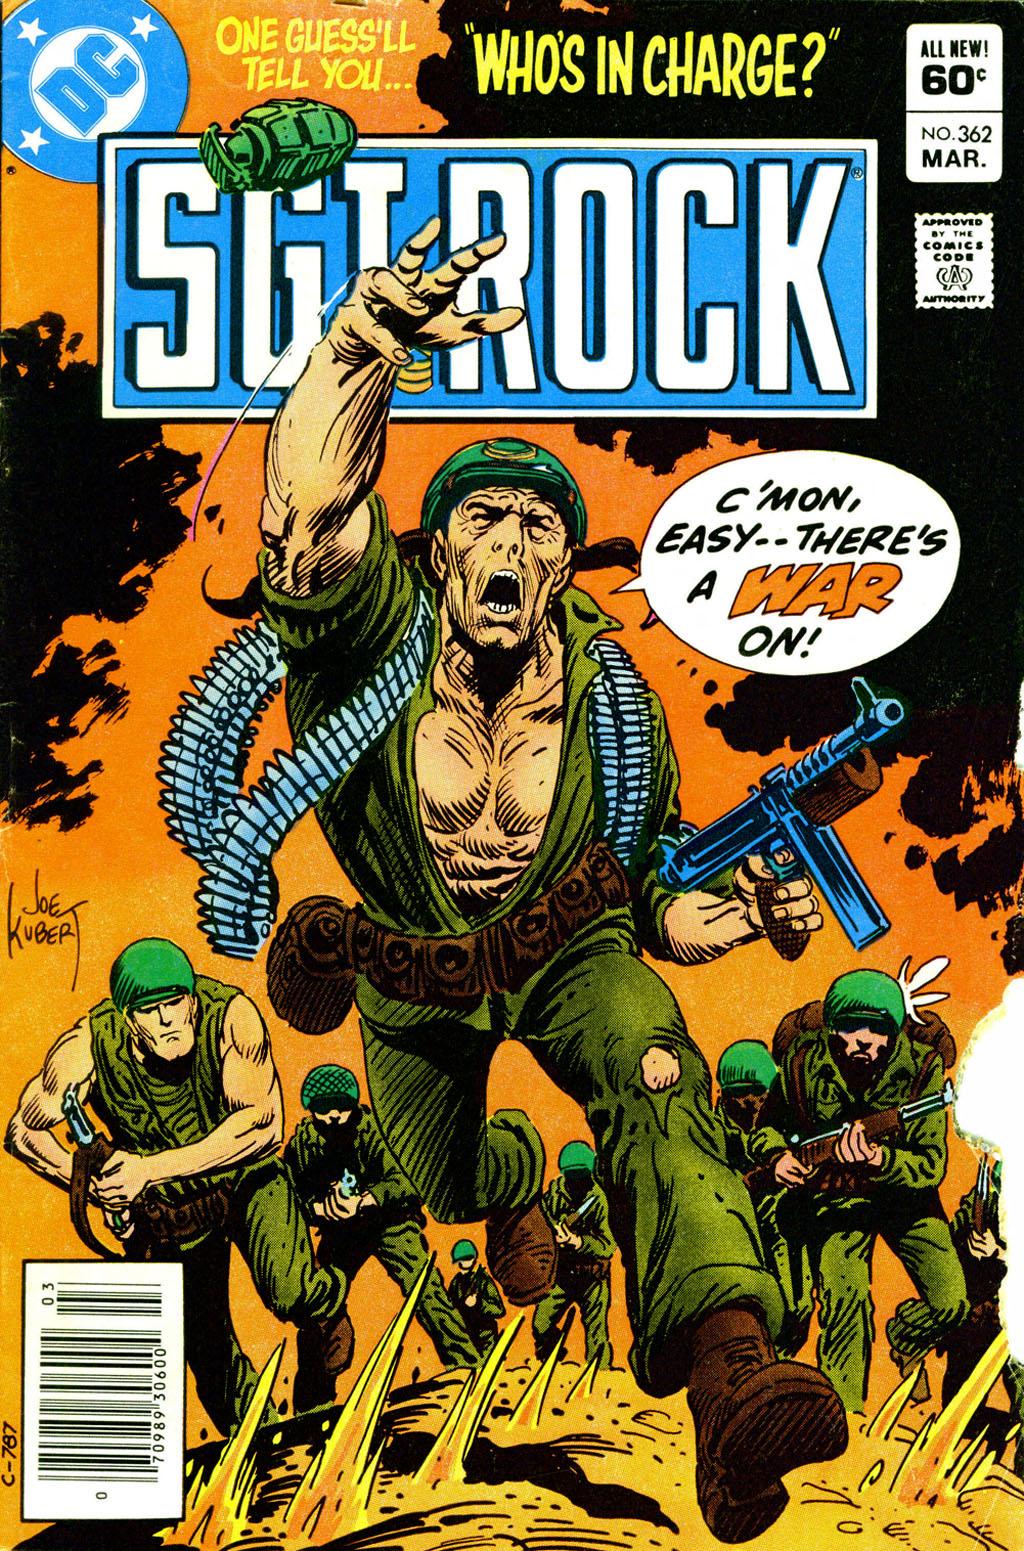 Read online Sgt. Rock comic -  Issue #362 - 1